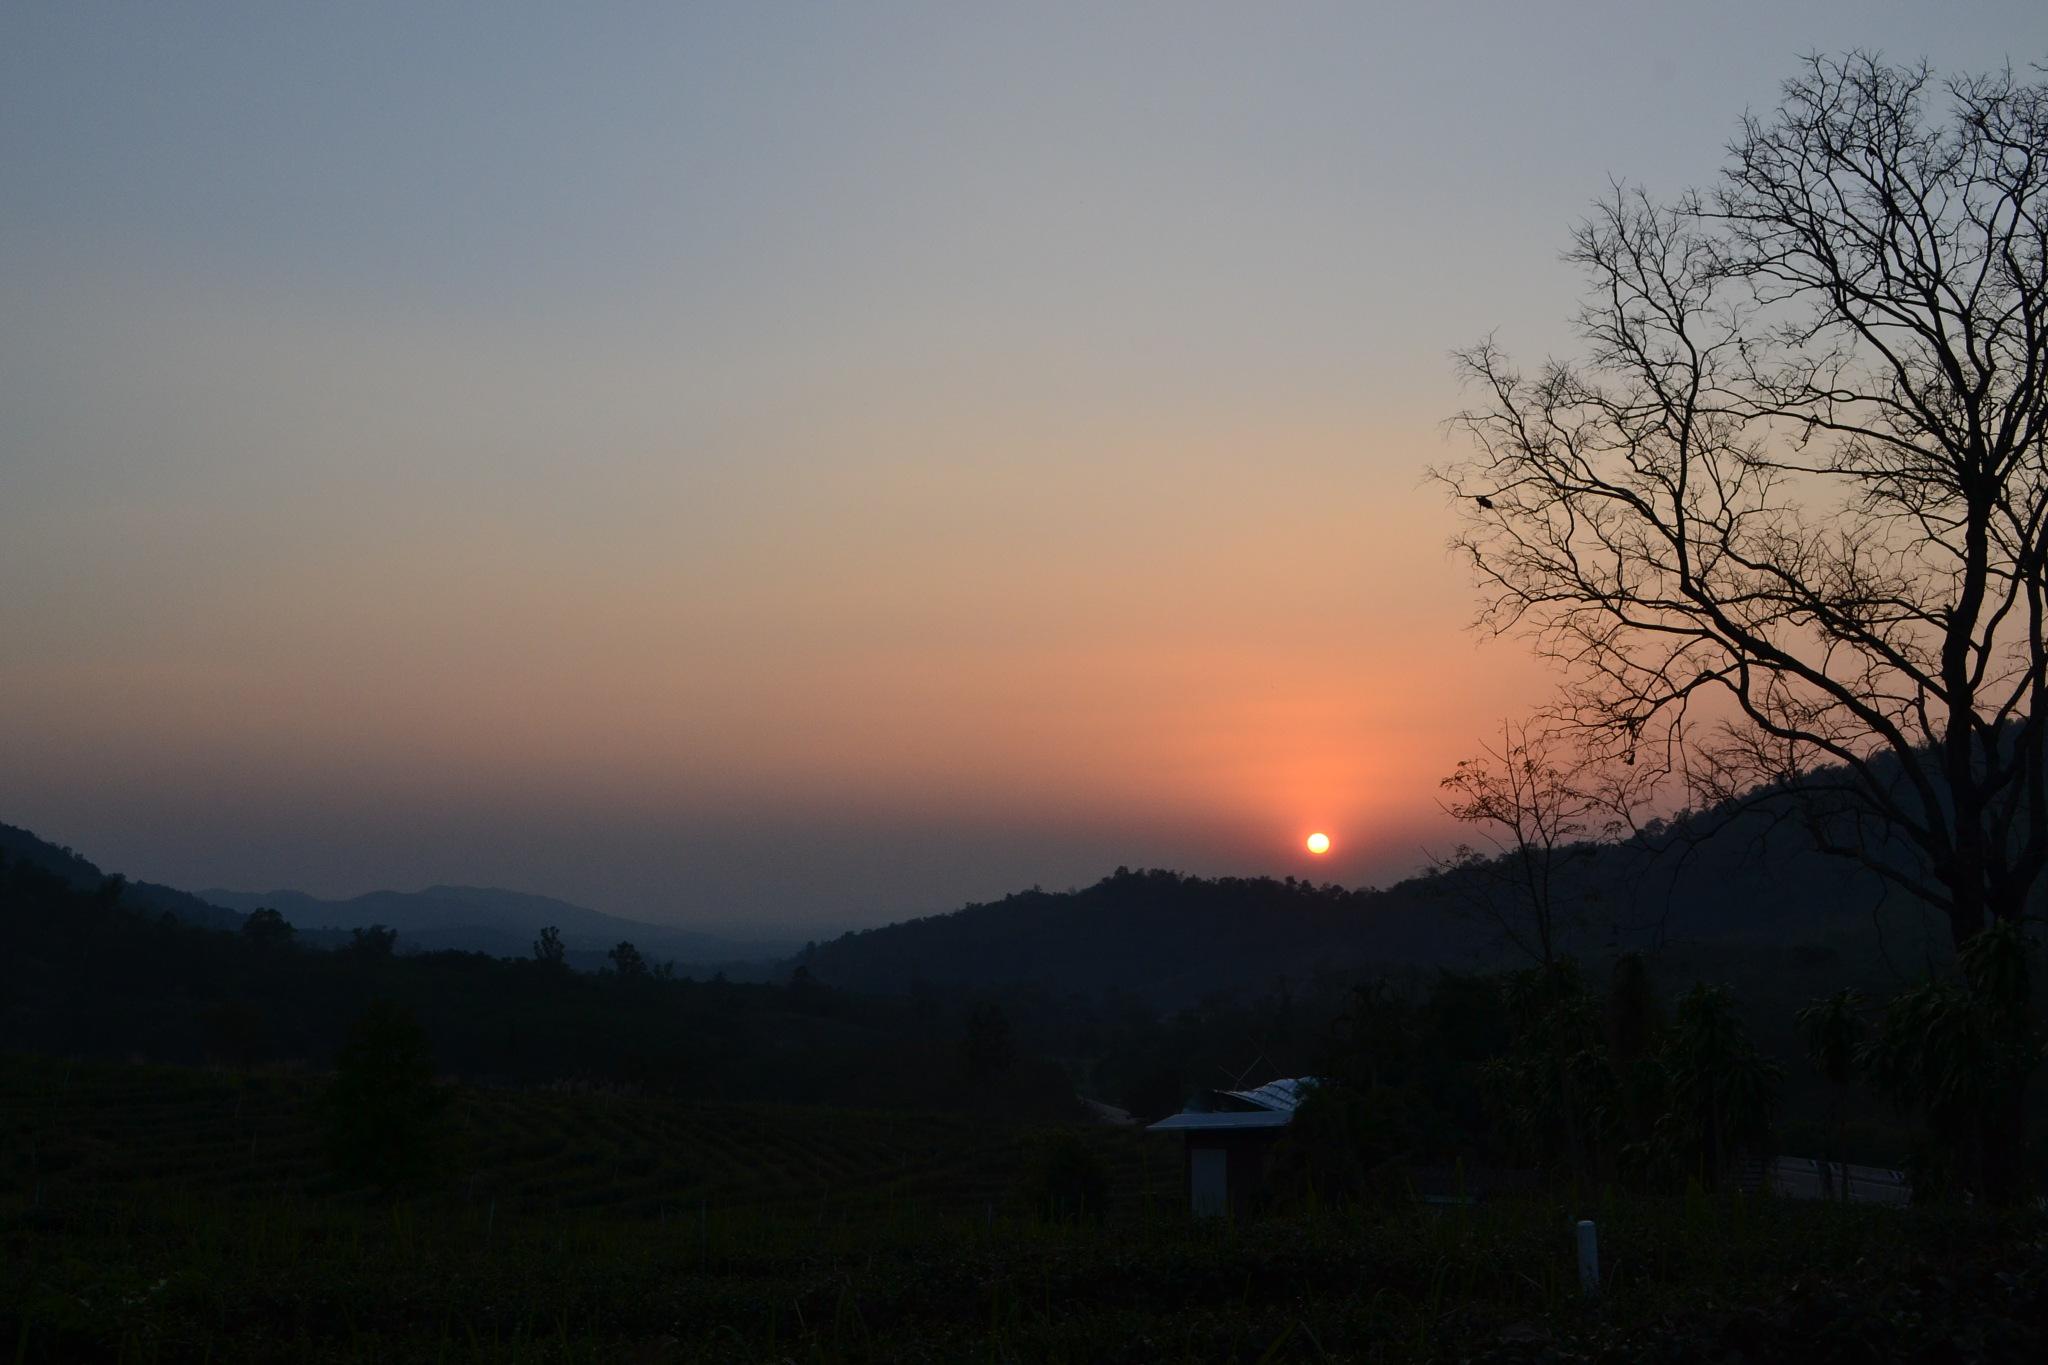 My evening*^* by Kanittha Sritipeng